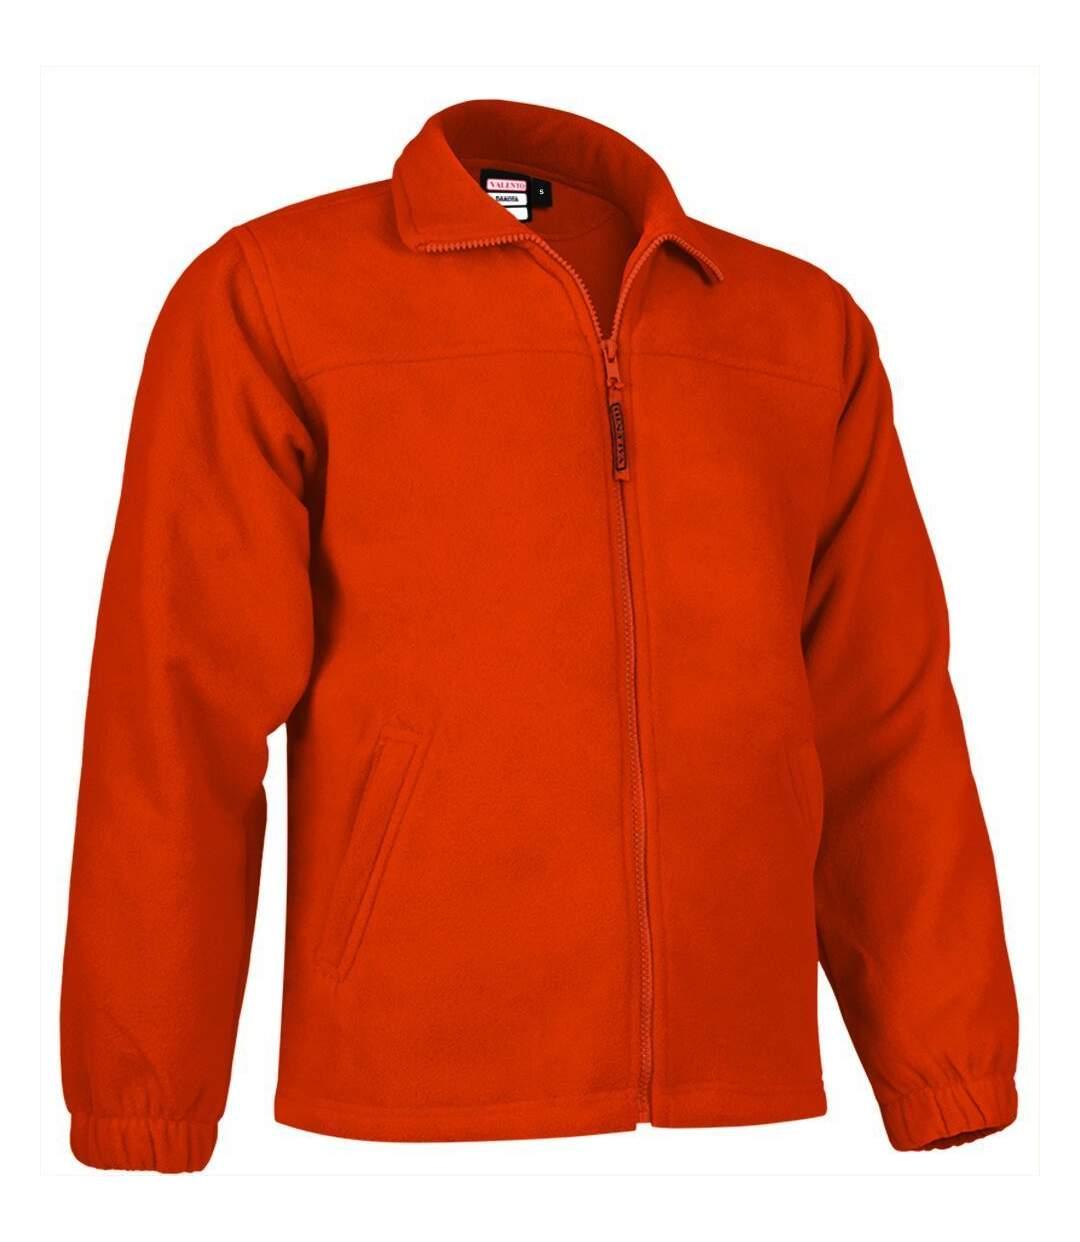 Veste polaire zippée - Homme - REF DAKOTA - orange